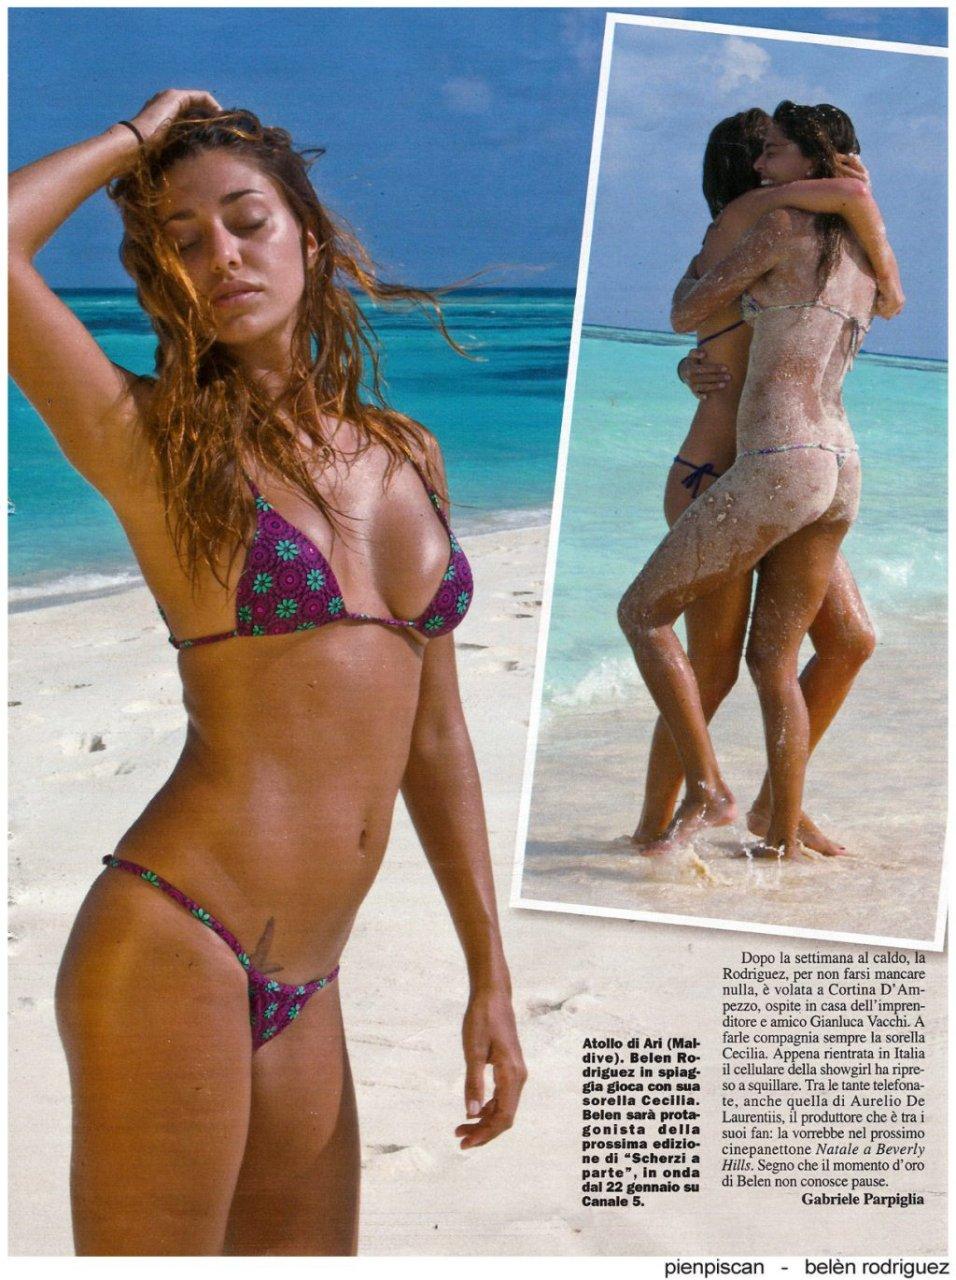 Belen rodriguez sex bikini nude blogspot